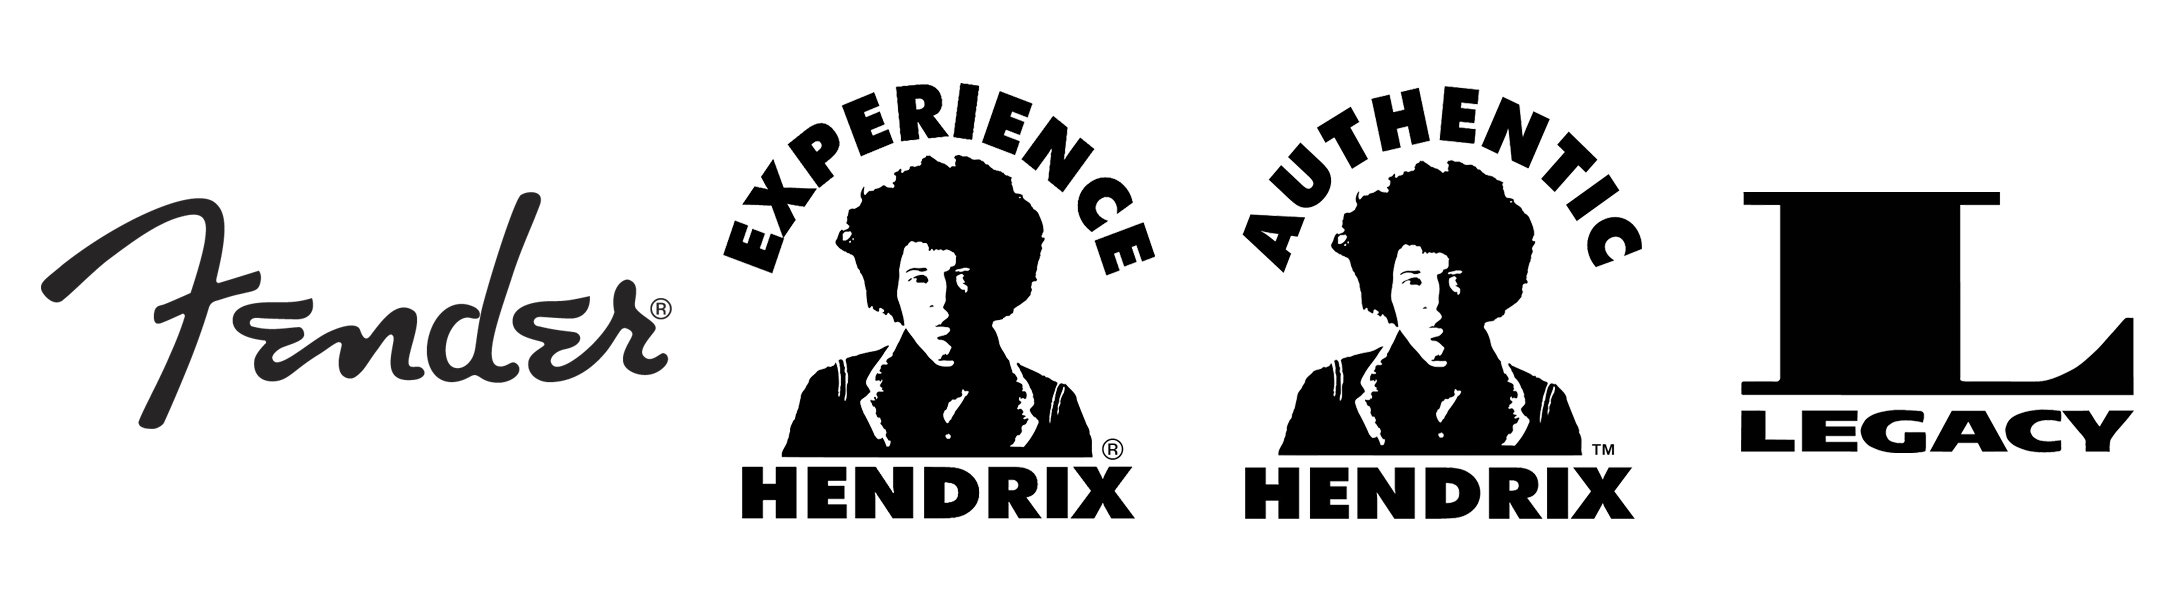 Fender_Hendrix_Legacy_logos